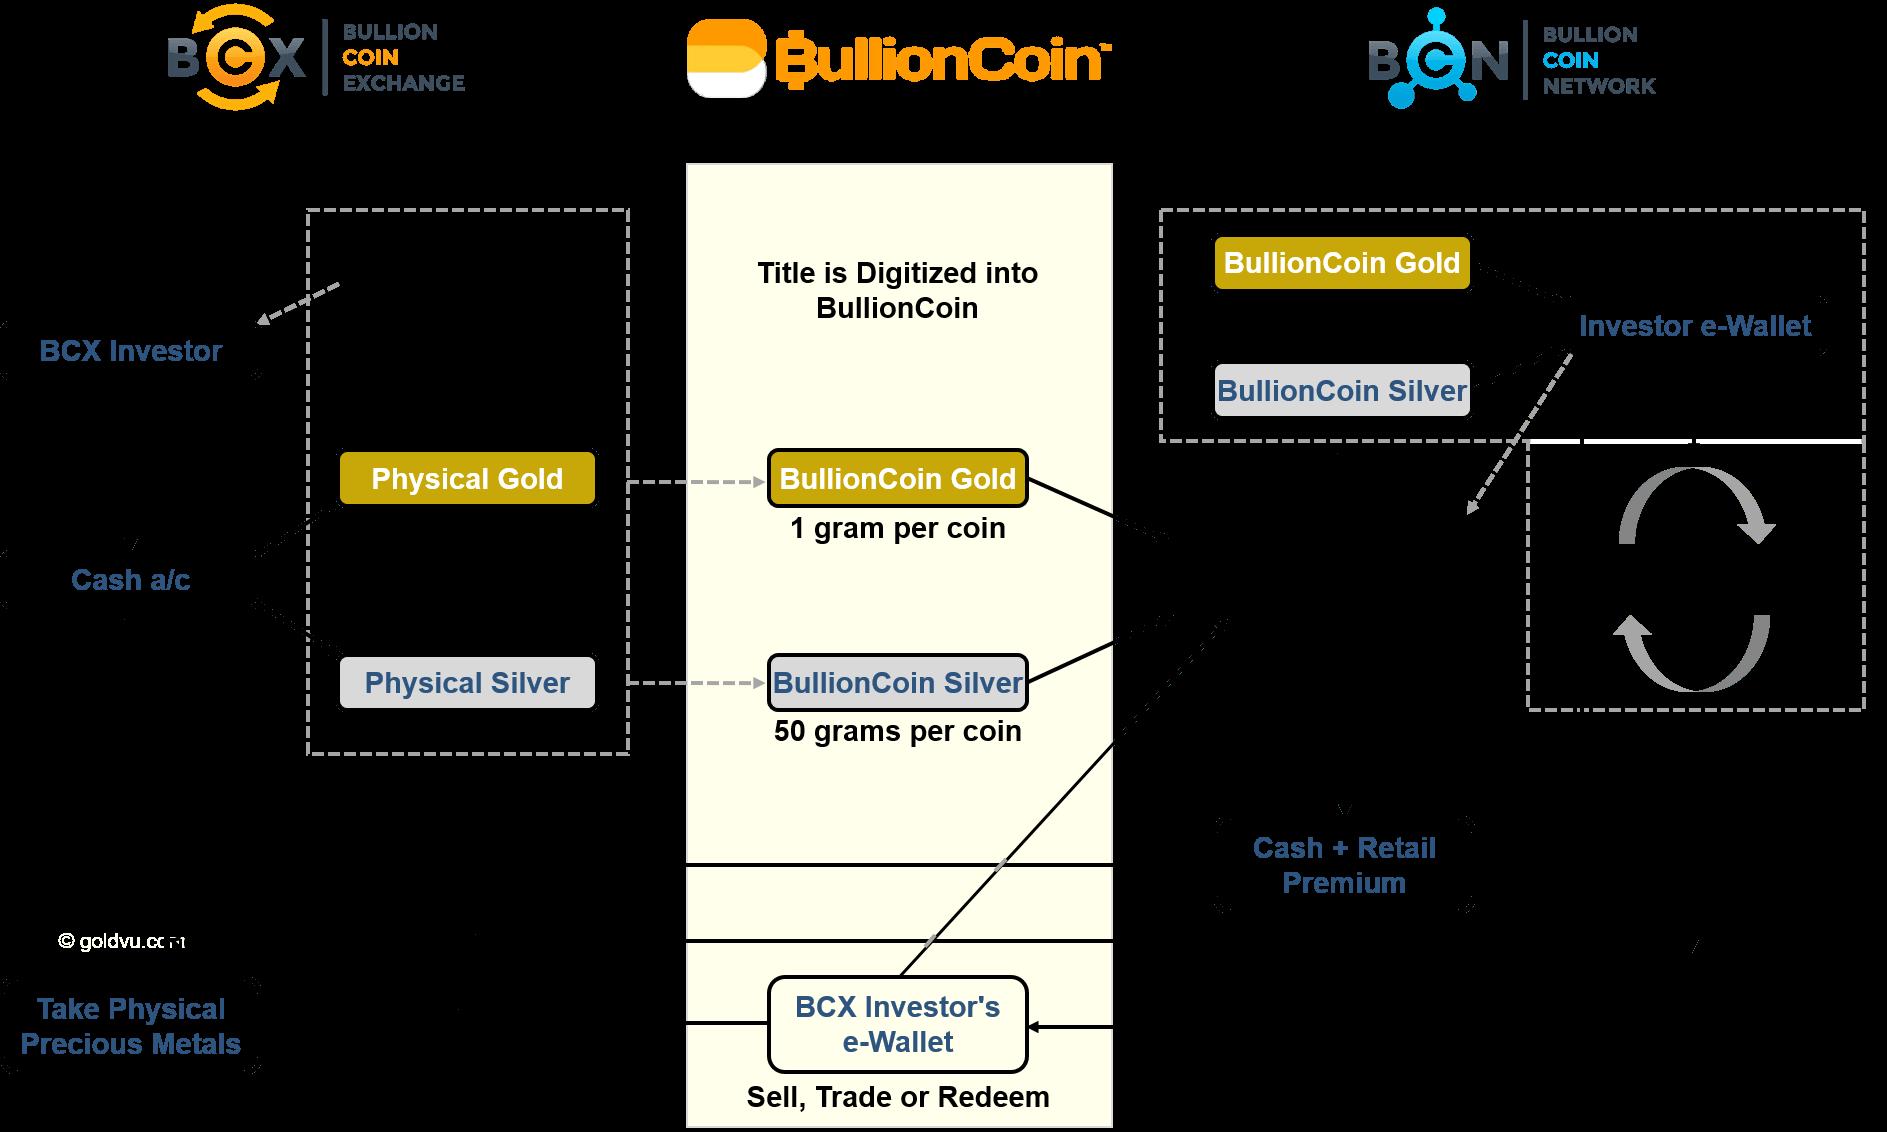 BullionCoin Exchange Network Life Cycle